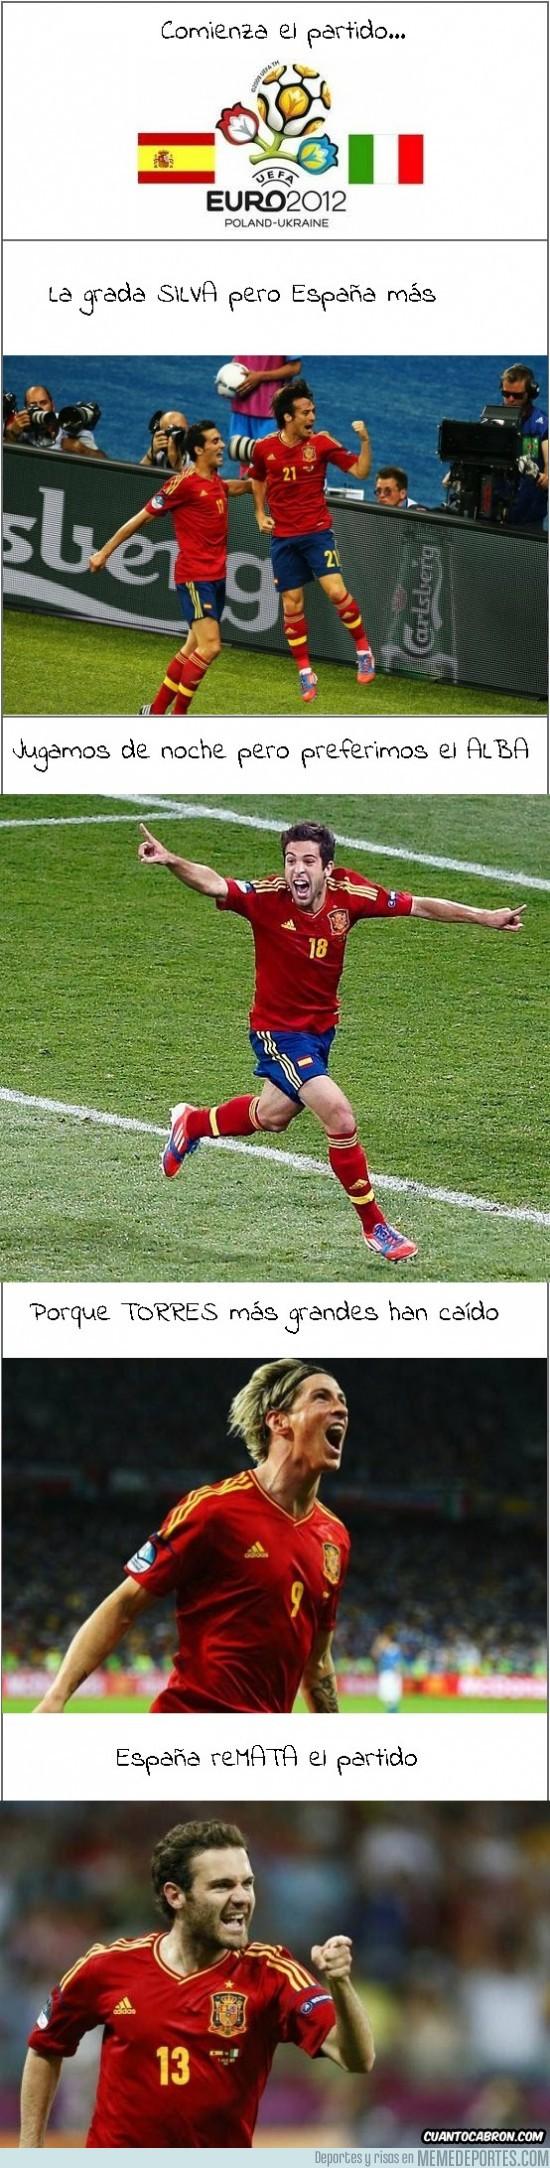 8236 - España,la historia de la final